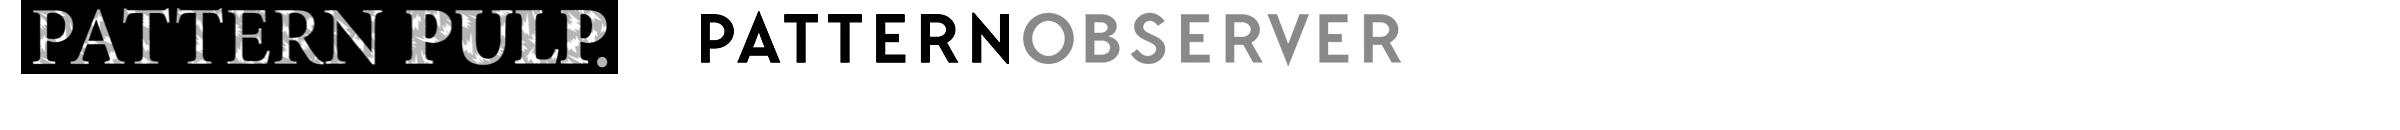 jessica-stuart-crump-patternobserver.jpg